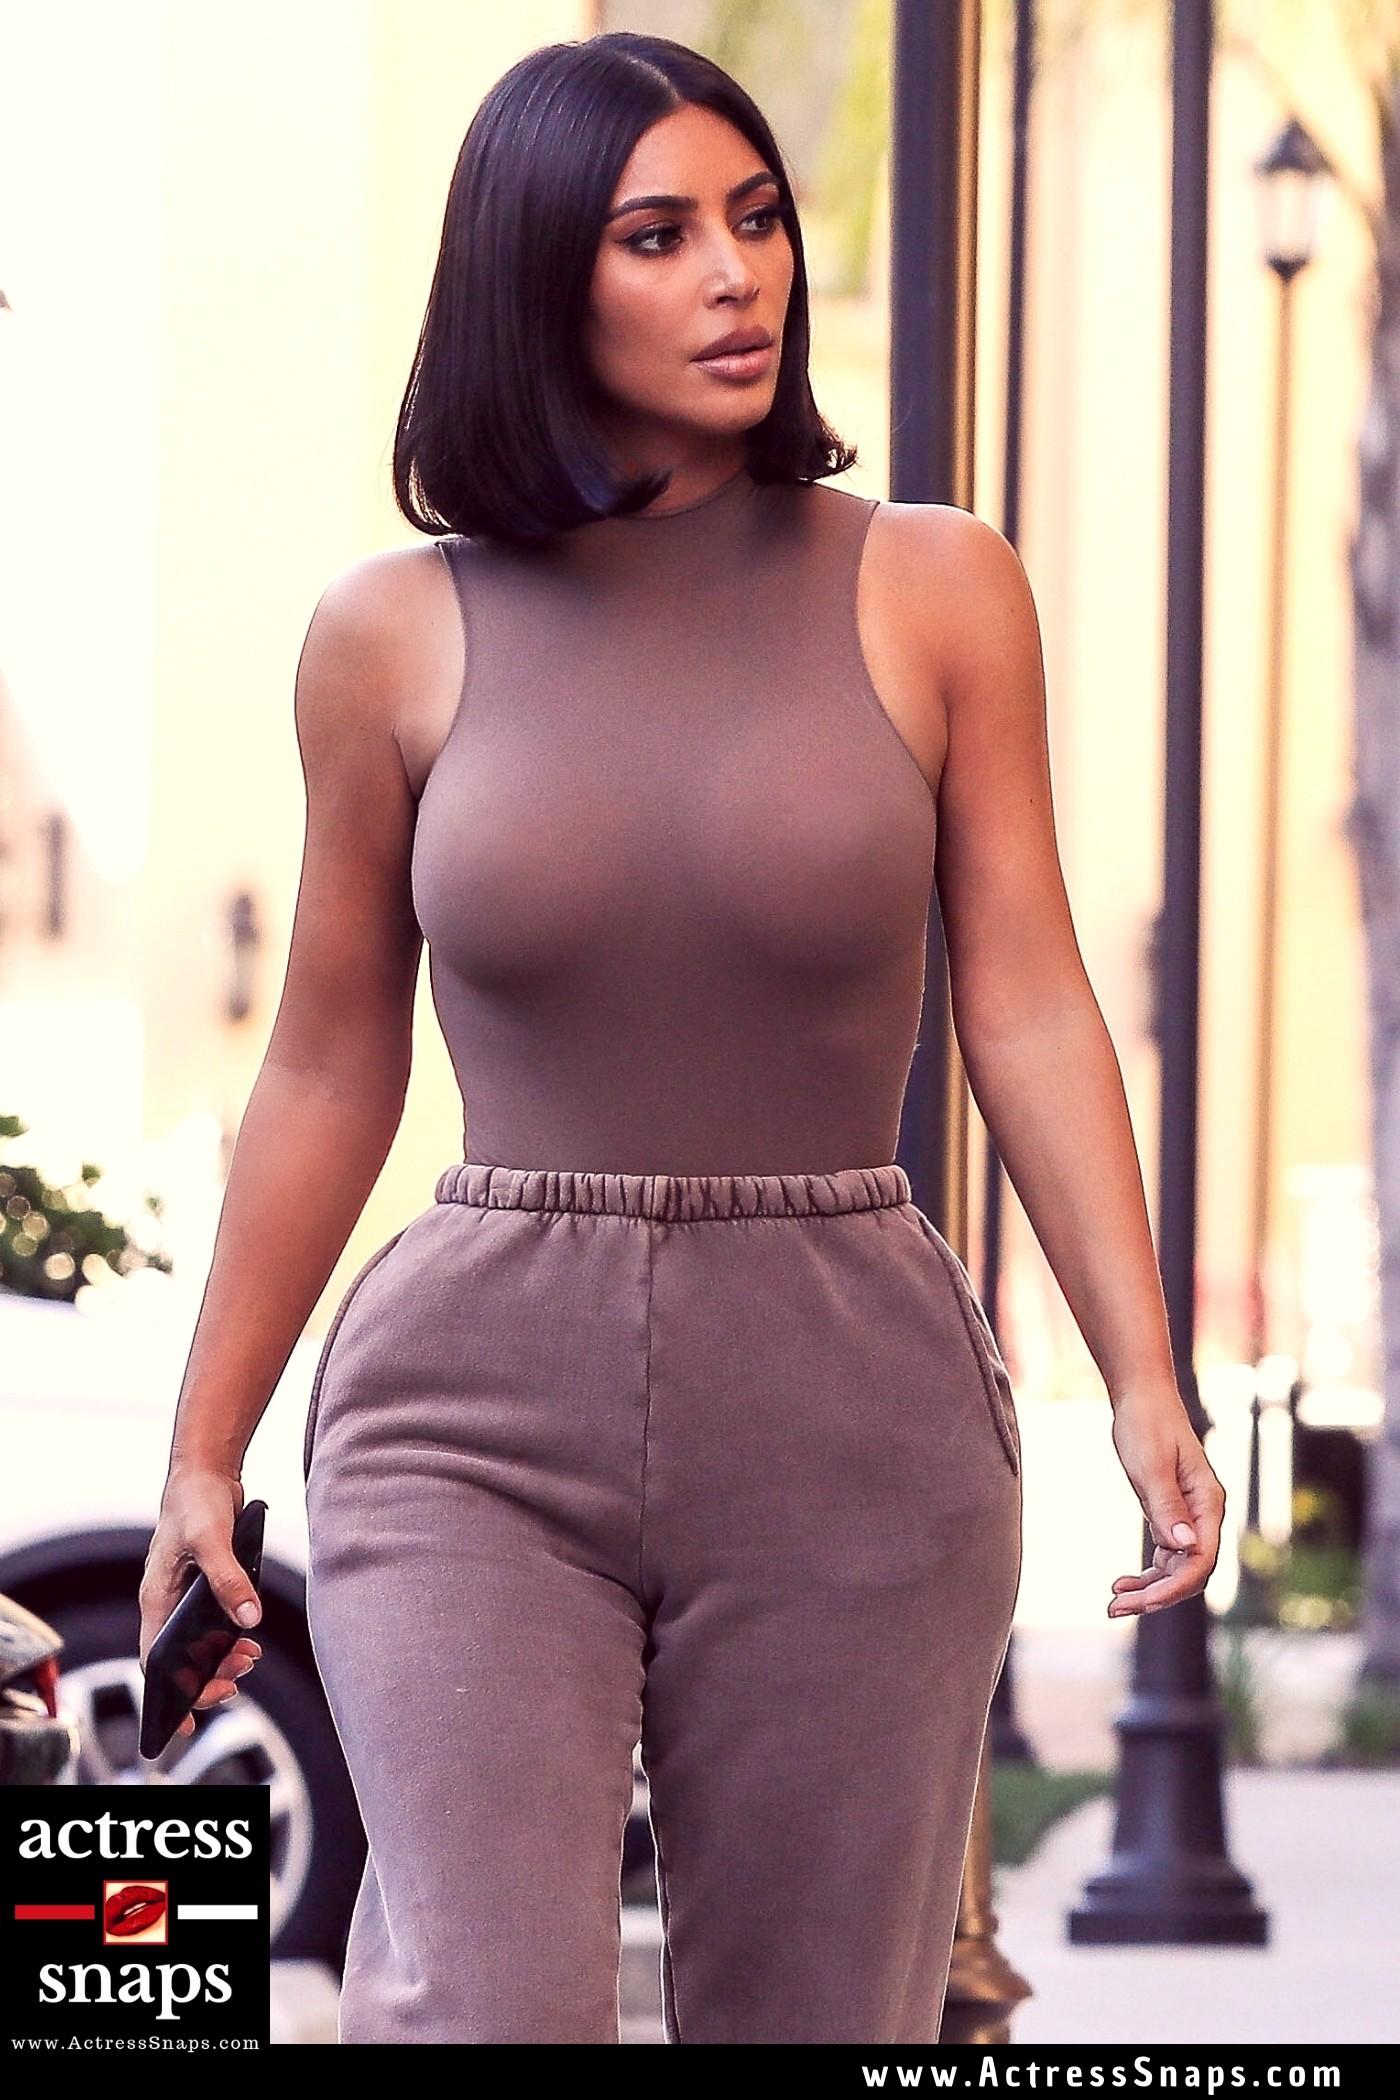 Latest Sexy Kim Kardashian Photos - Sexy Actress Pictures | Hot Actress Pictures - ActressSnaps.com